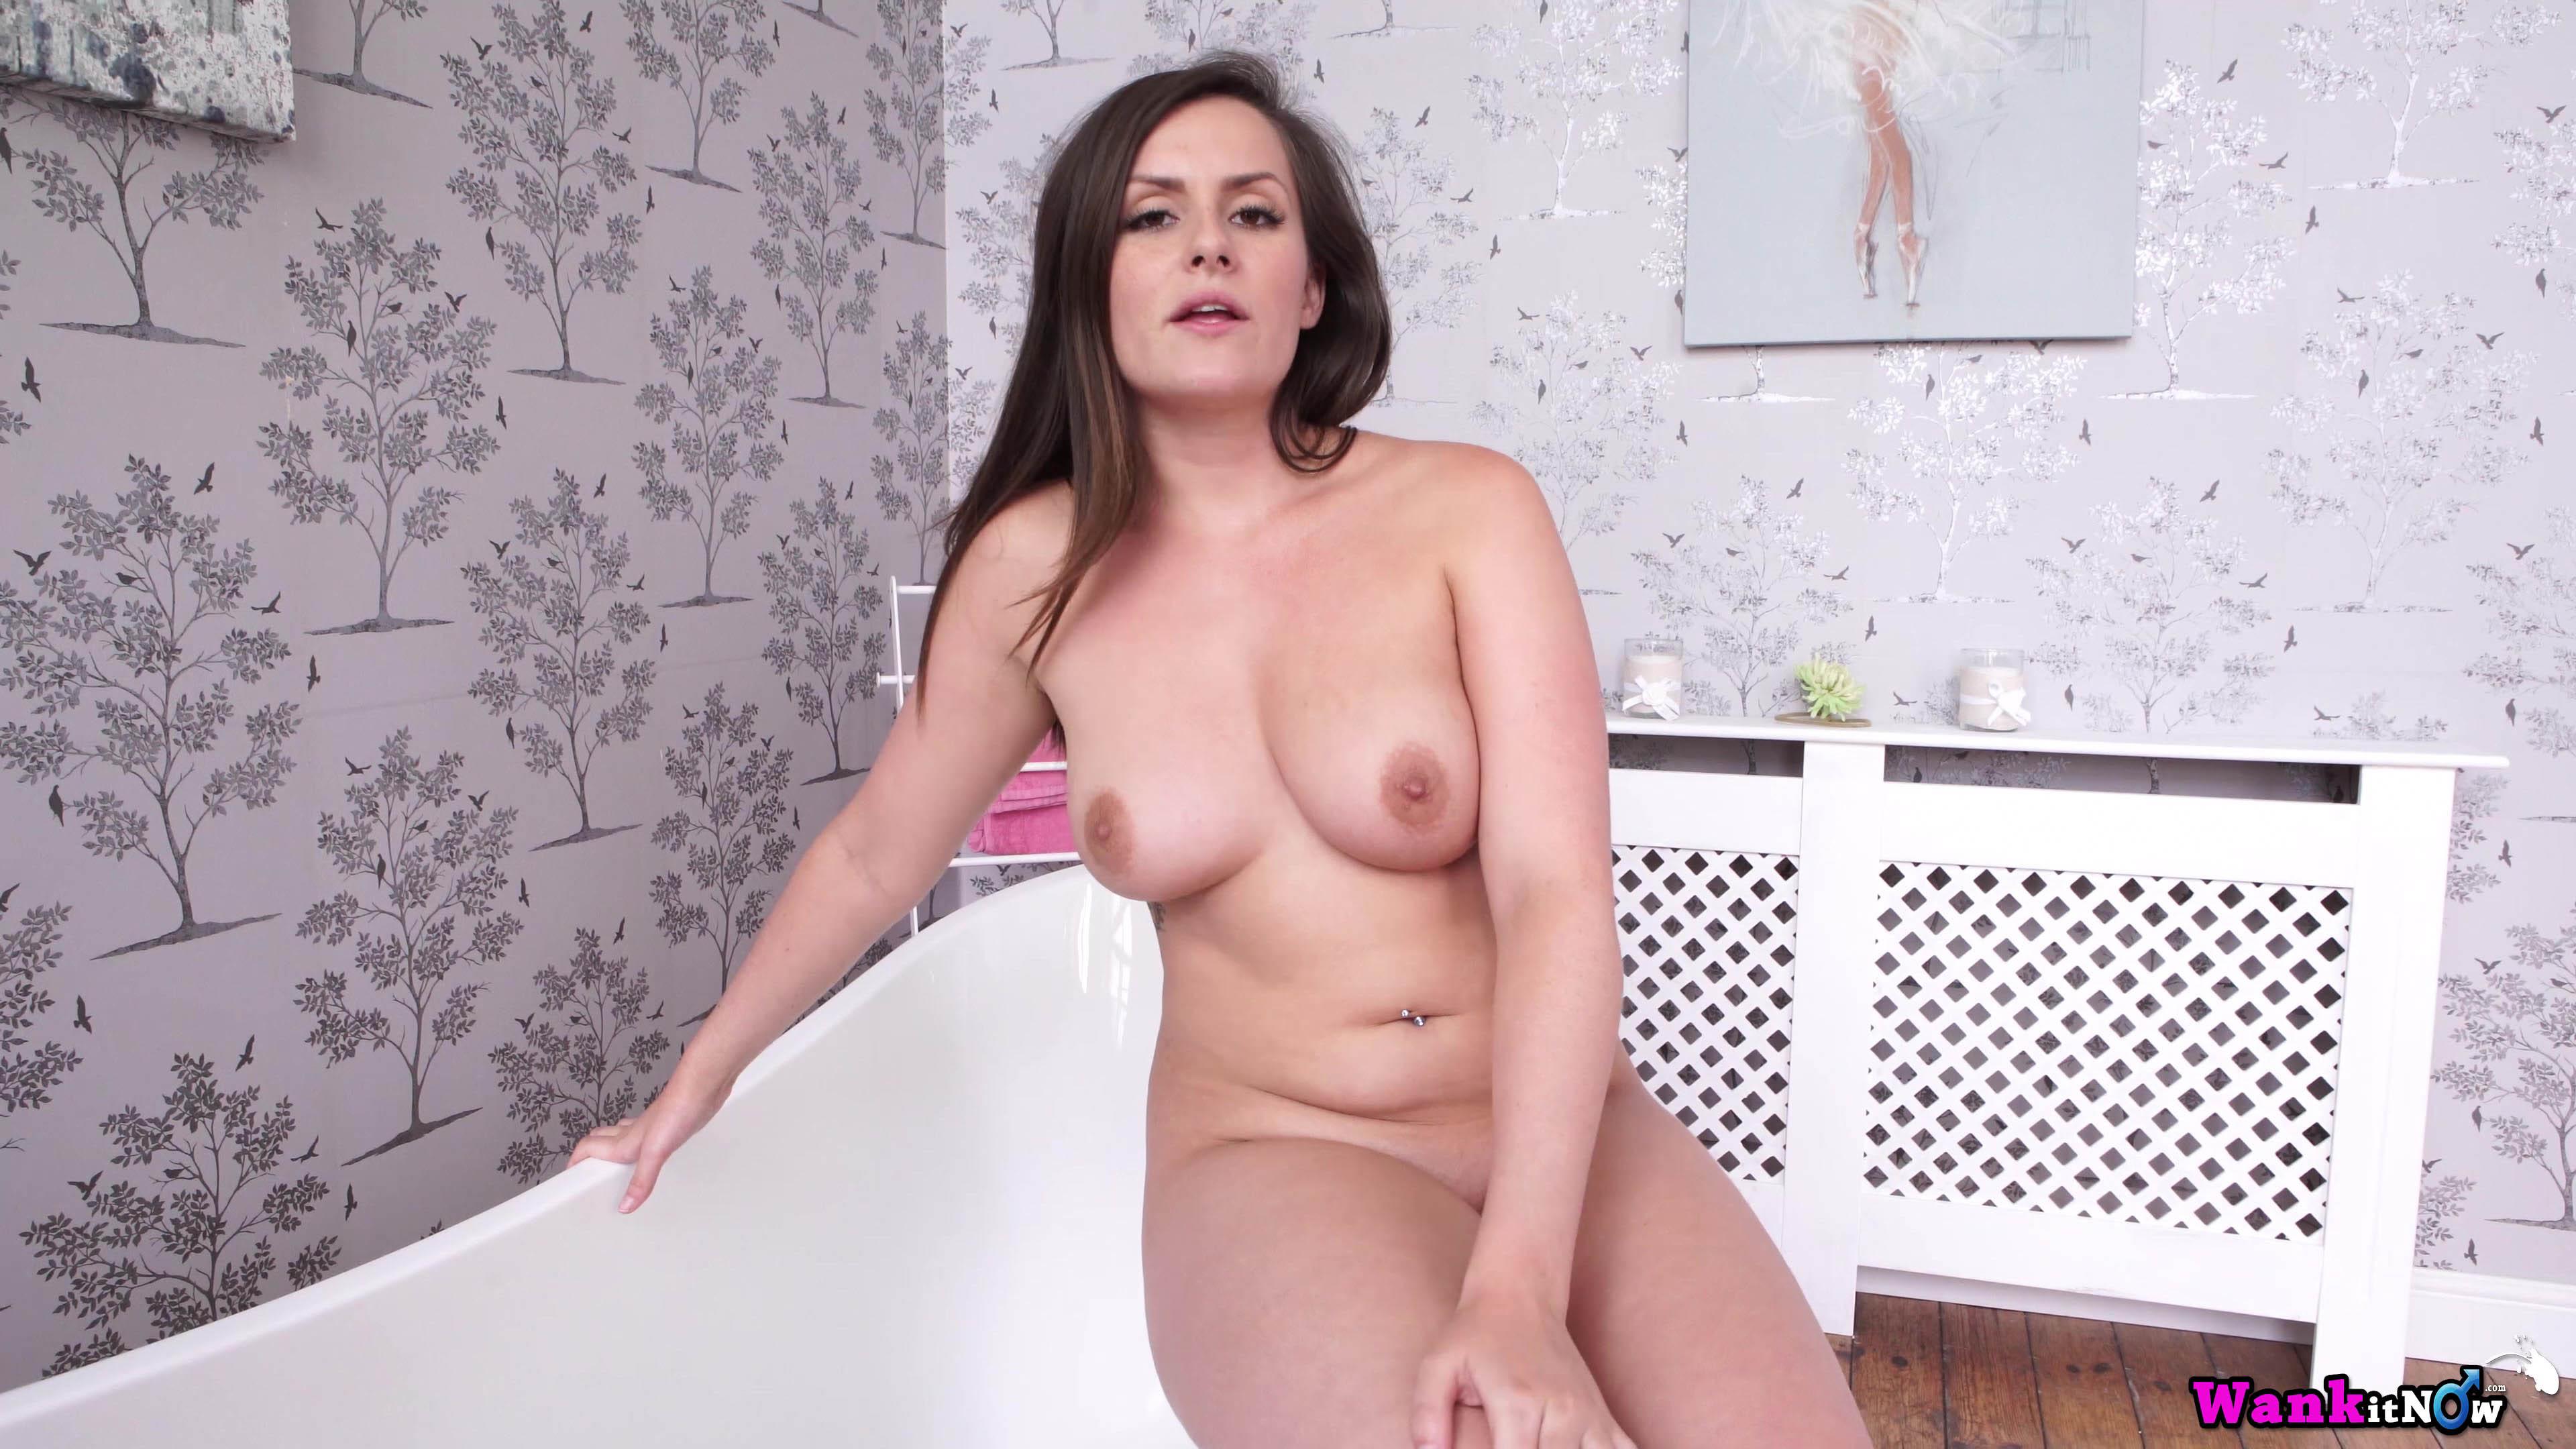 Charlie rose nude